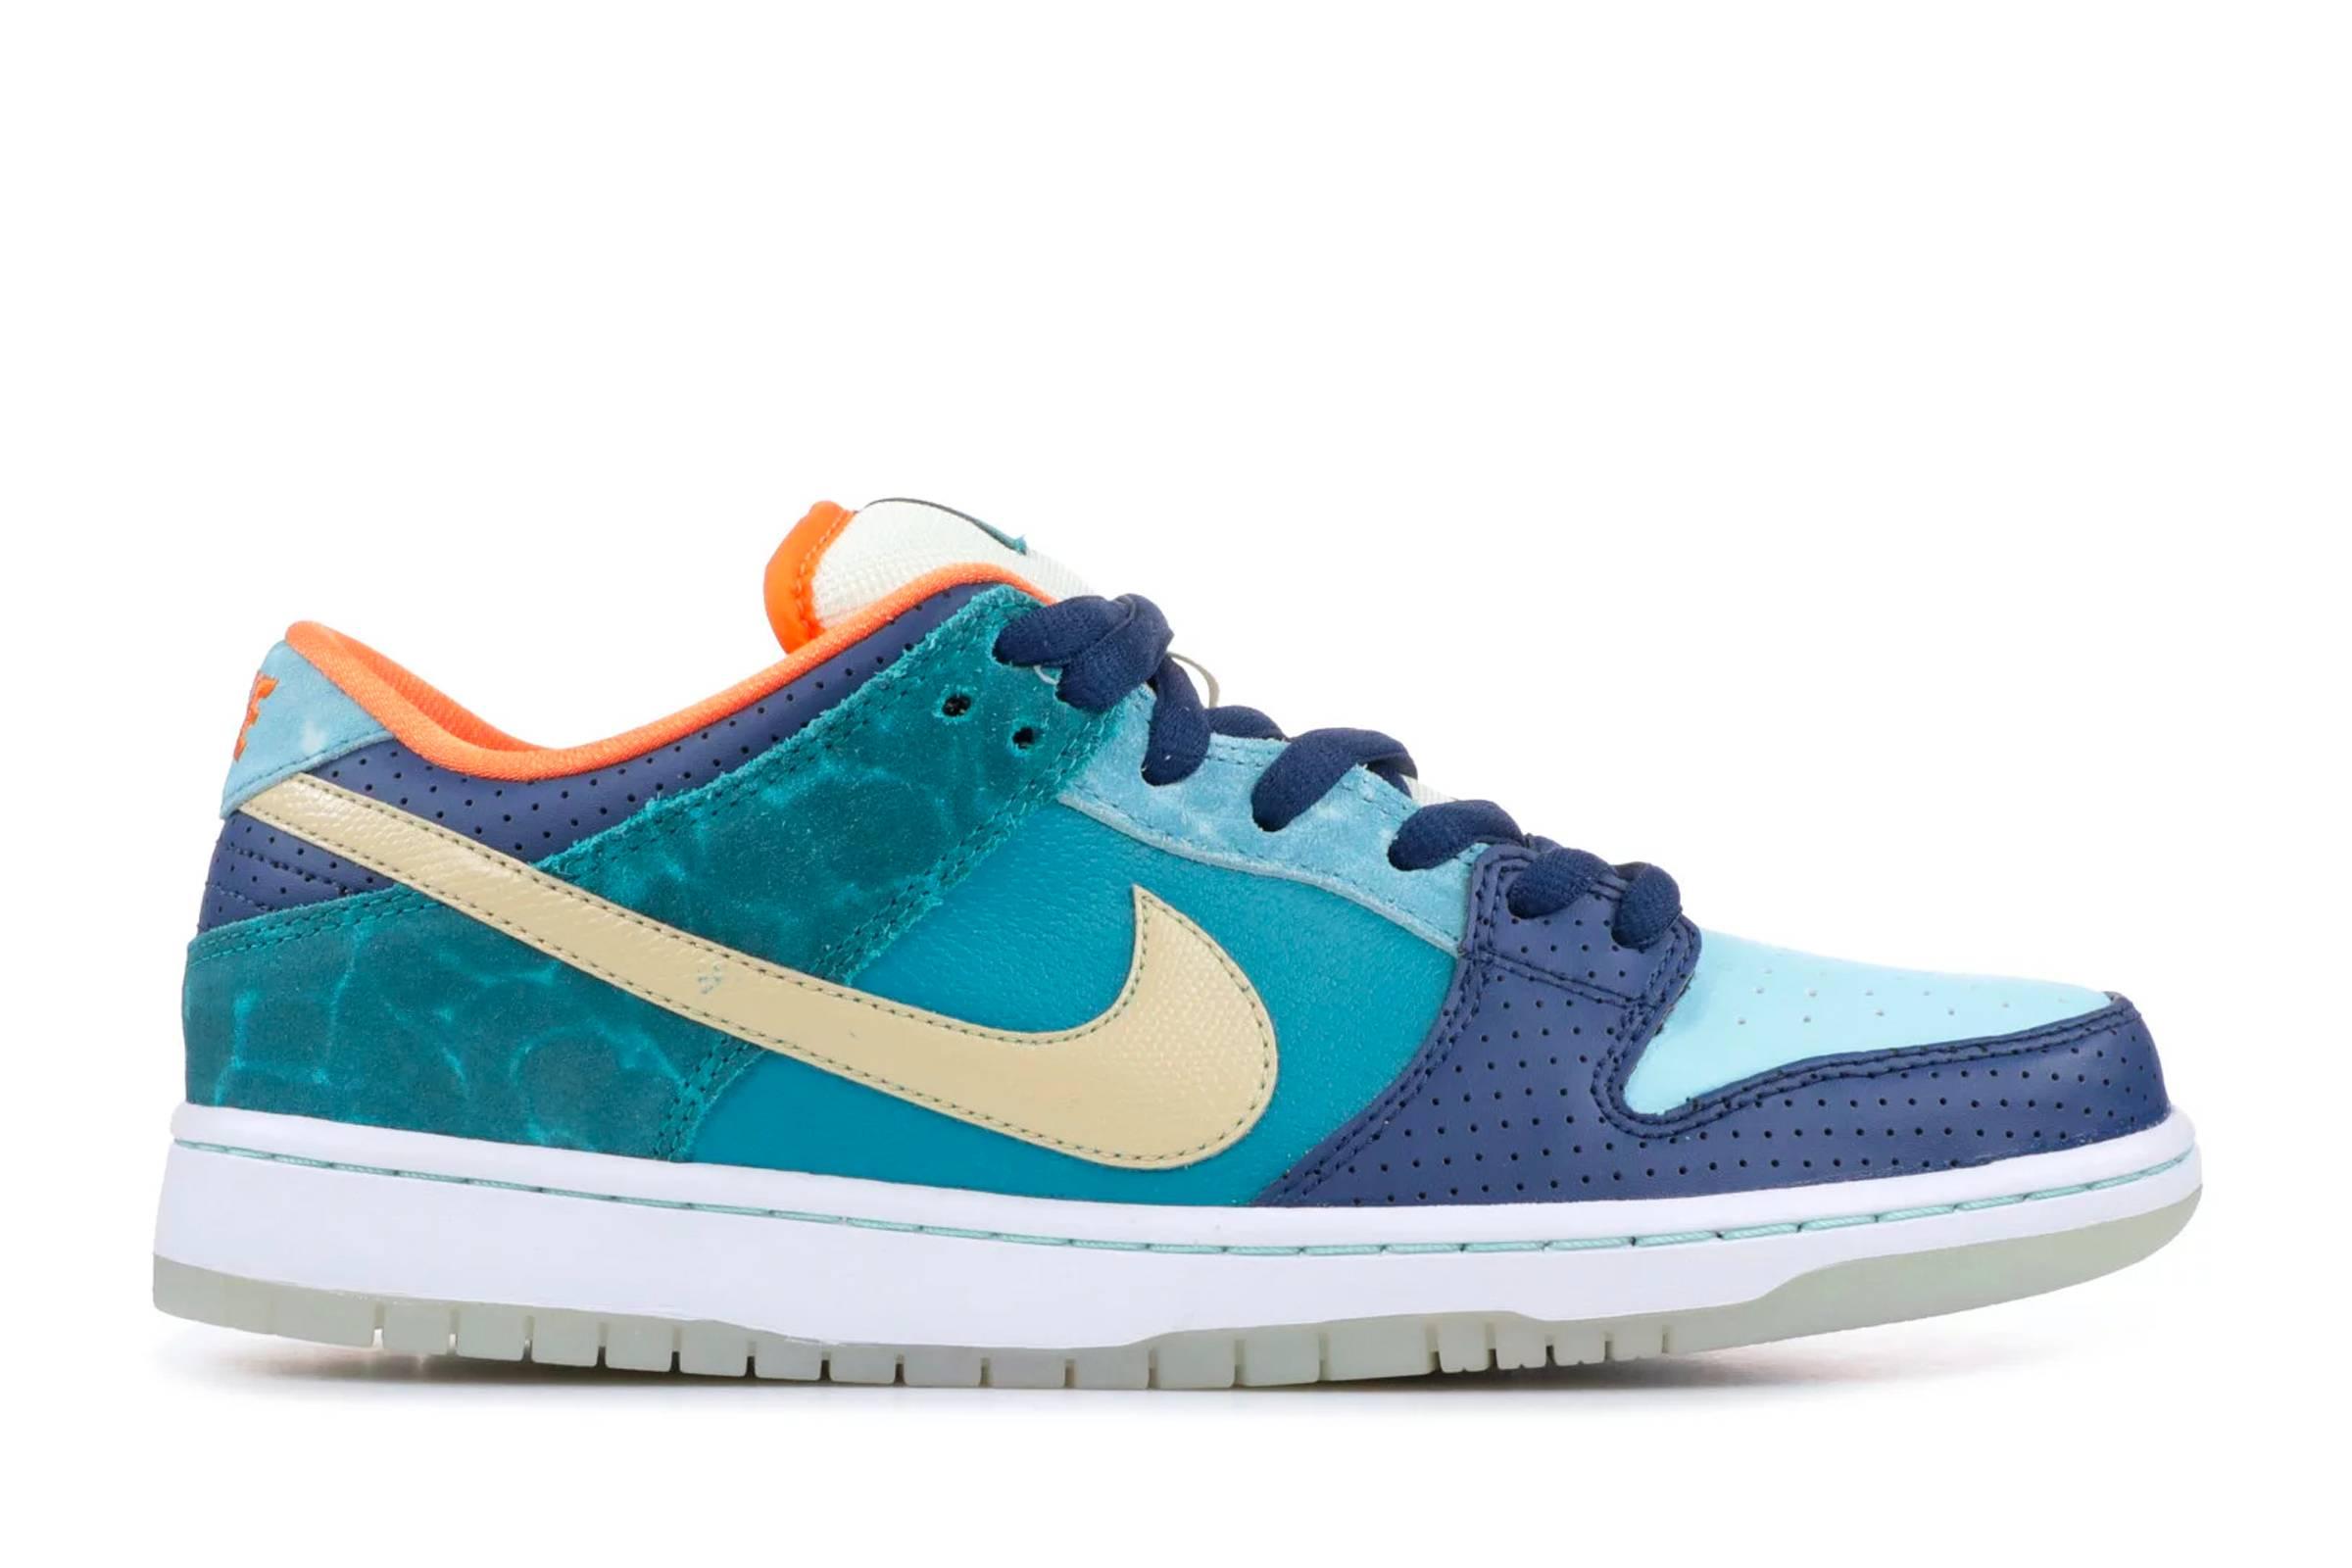 "Nike SB Dunk Low Premium QS ""Mia Skate Shop 10th Anniversary"""